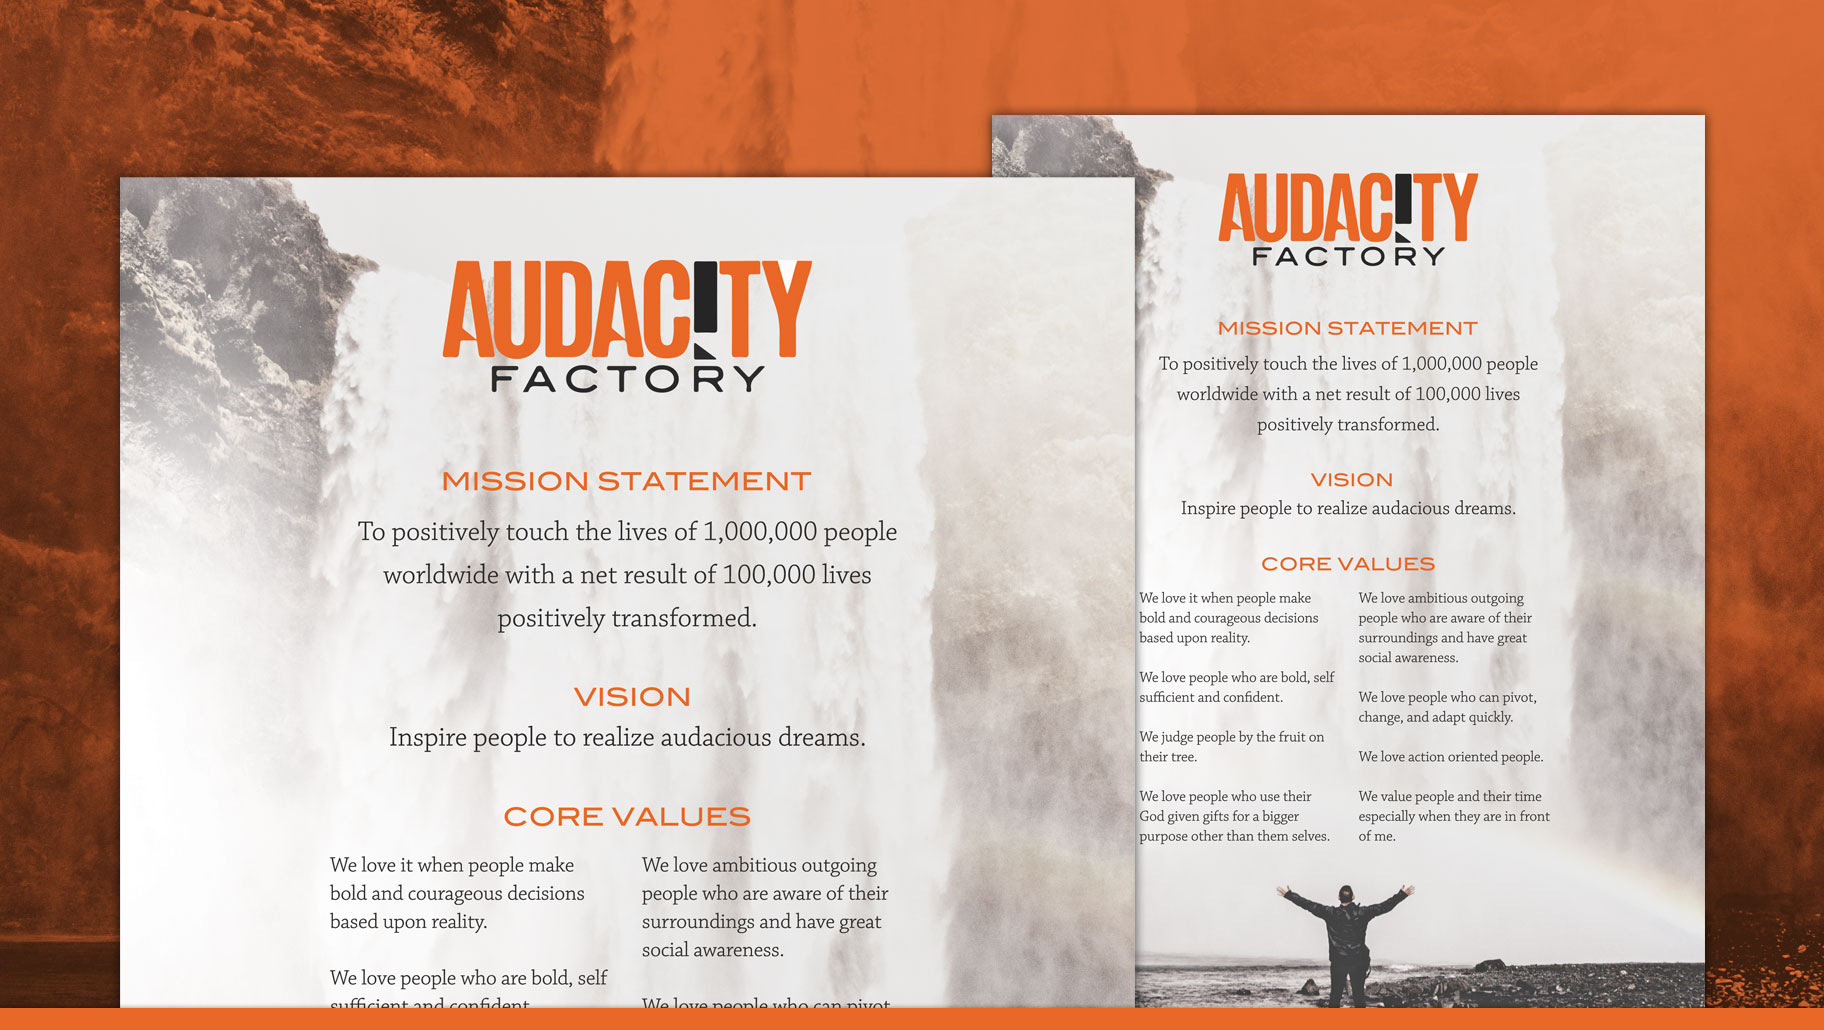 Audacity Factory